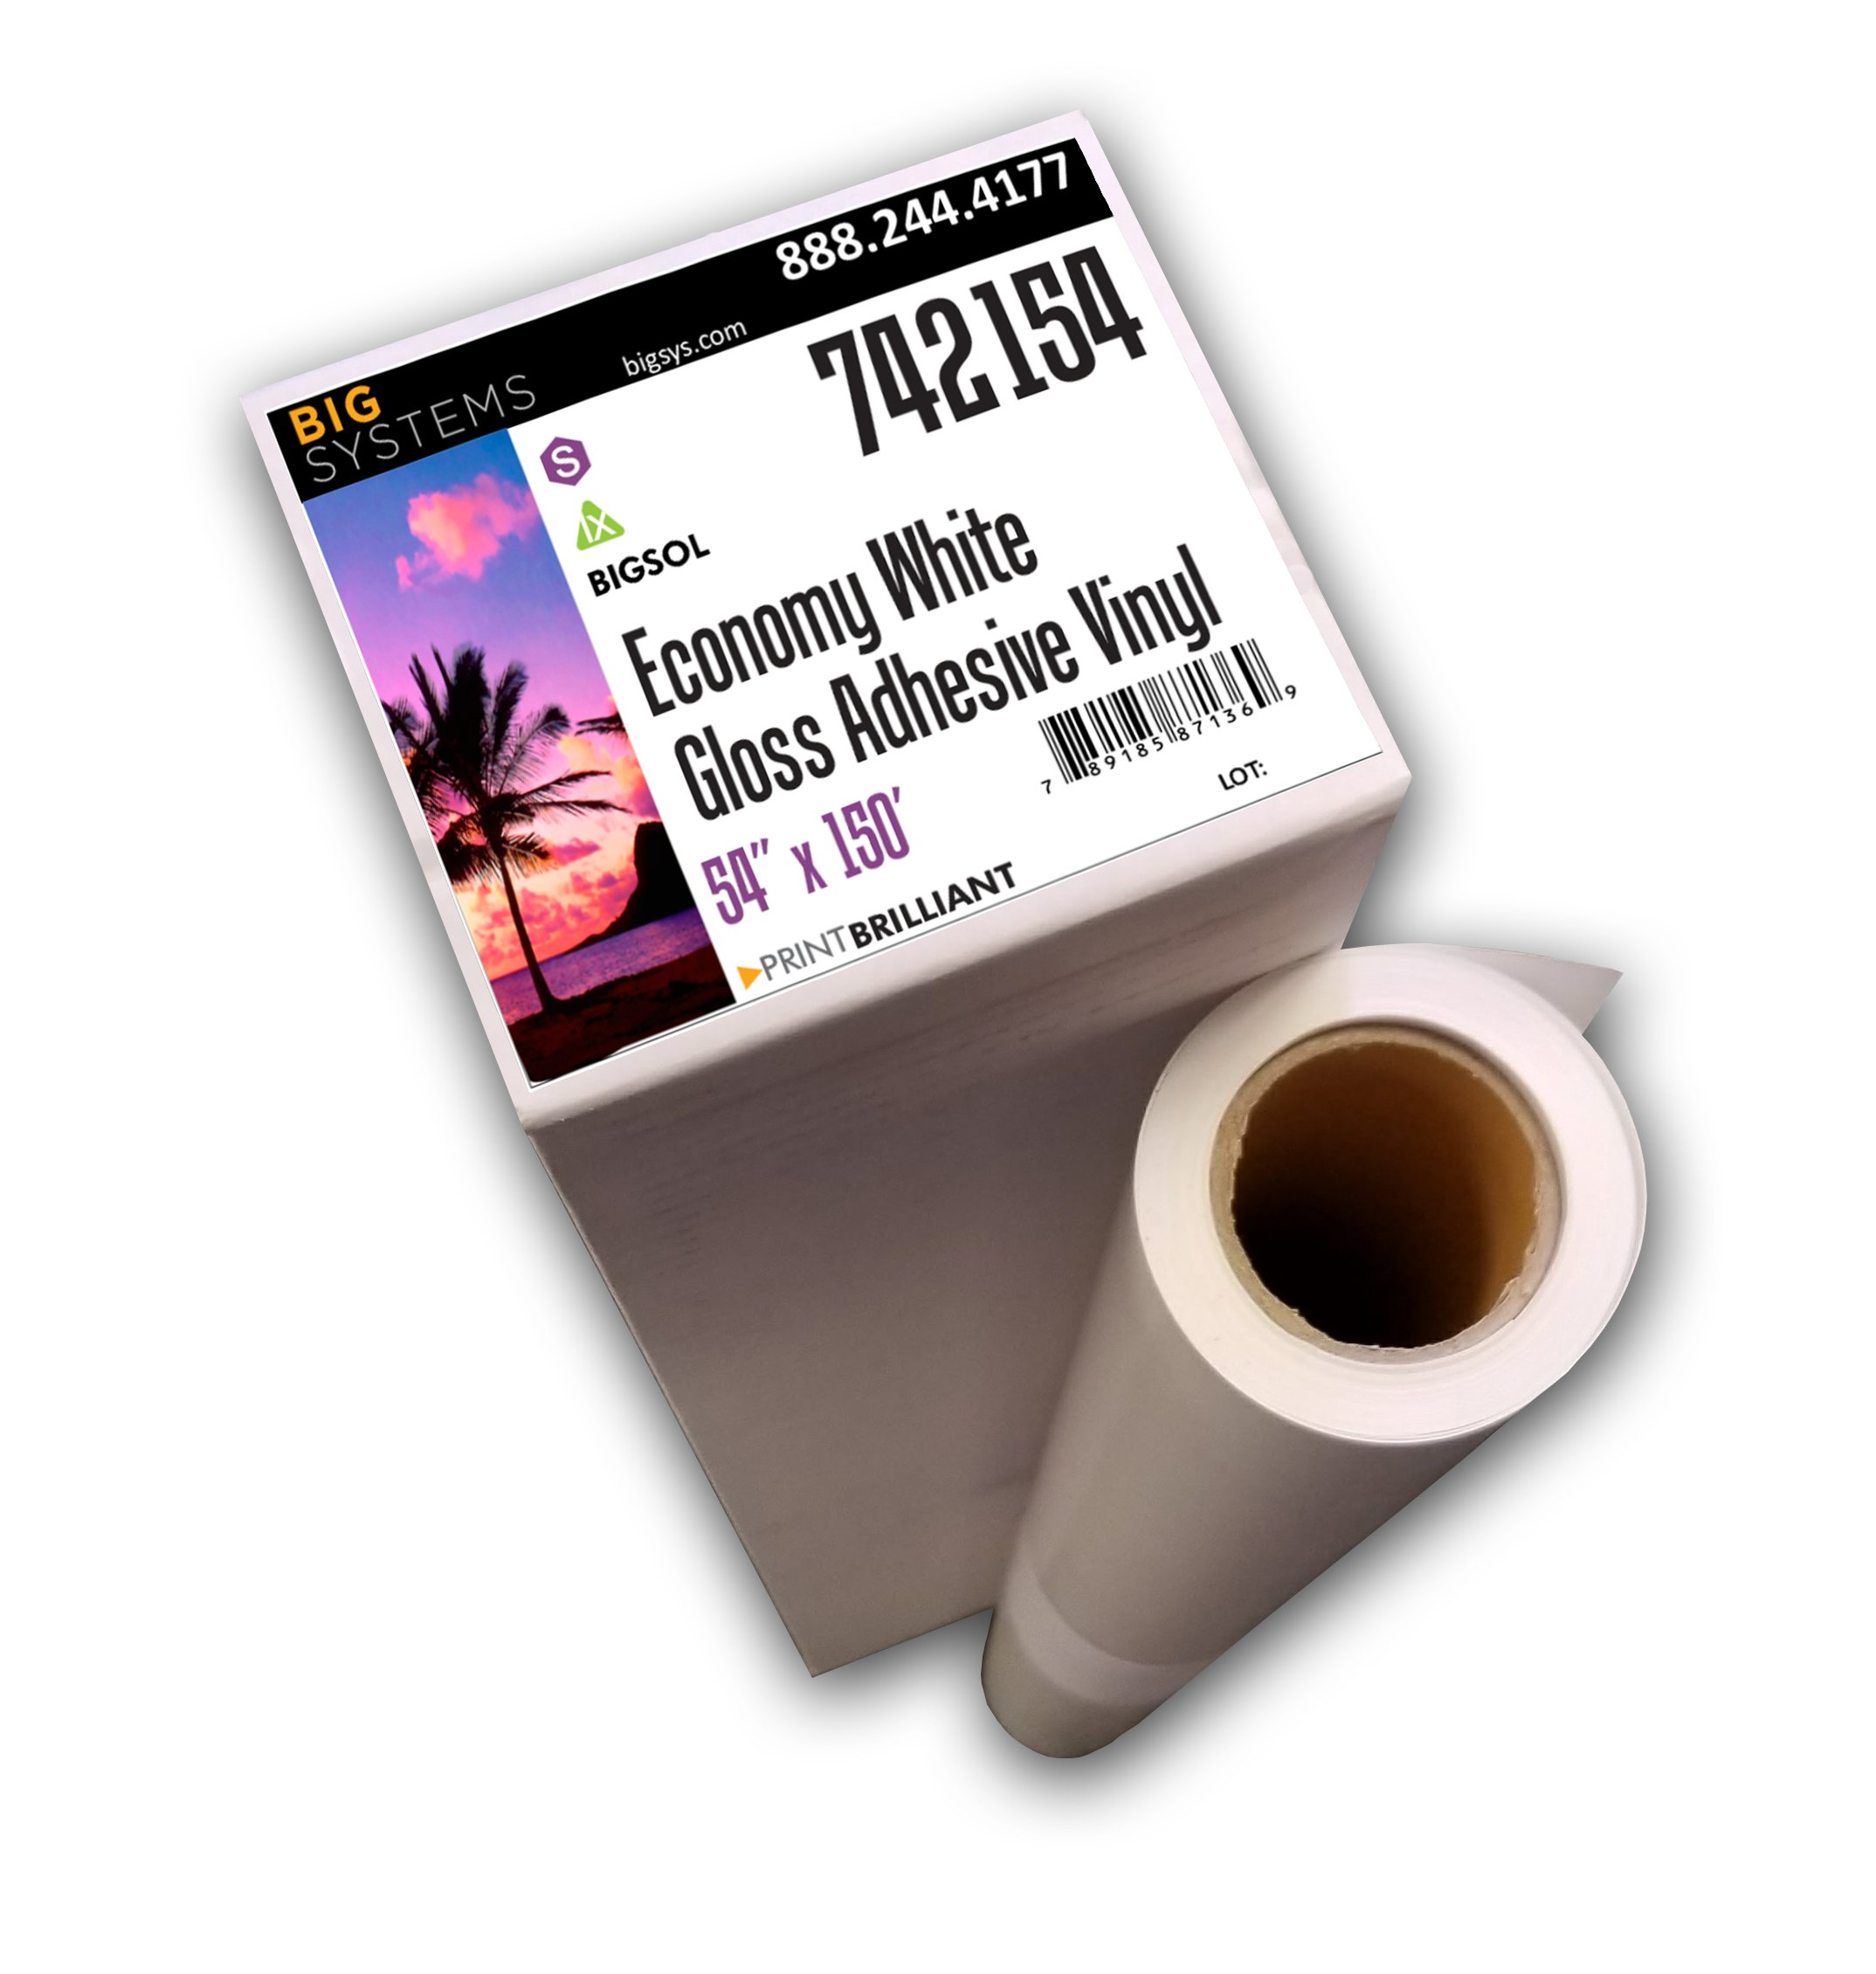 BigSol Solvent/Latex Gloss Economy Adhesive-Backed Vinyl (54'' x 150') by BigSol